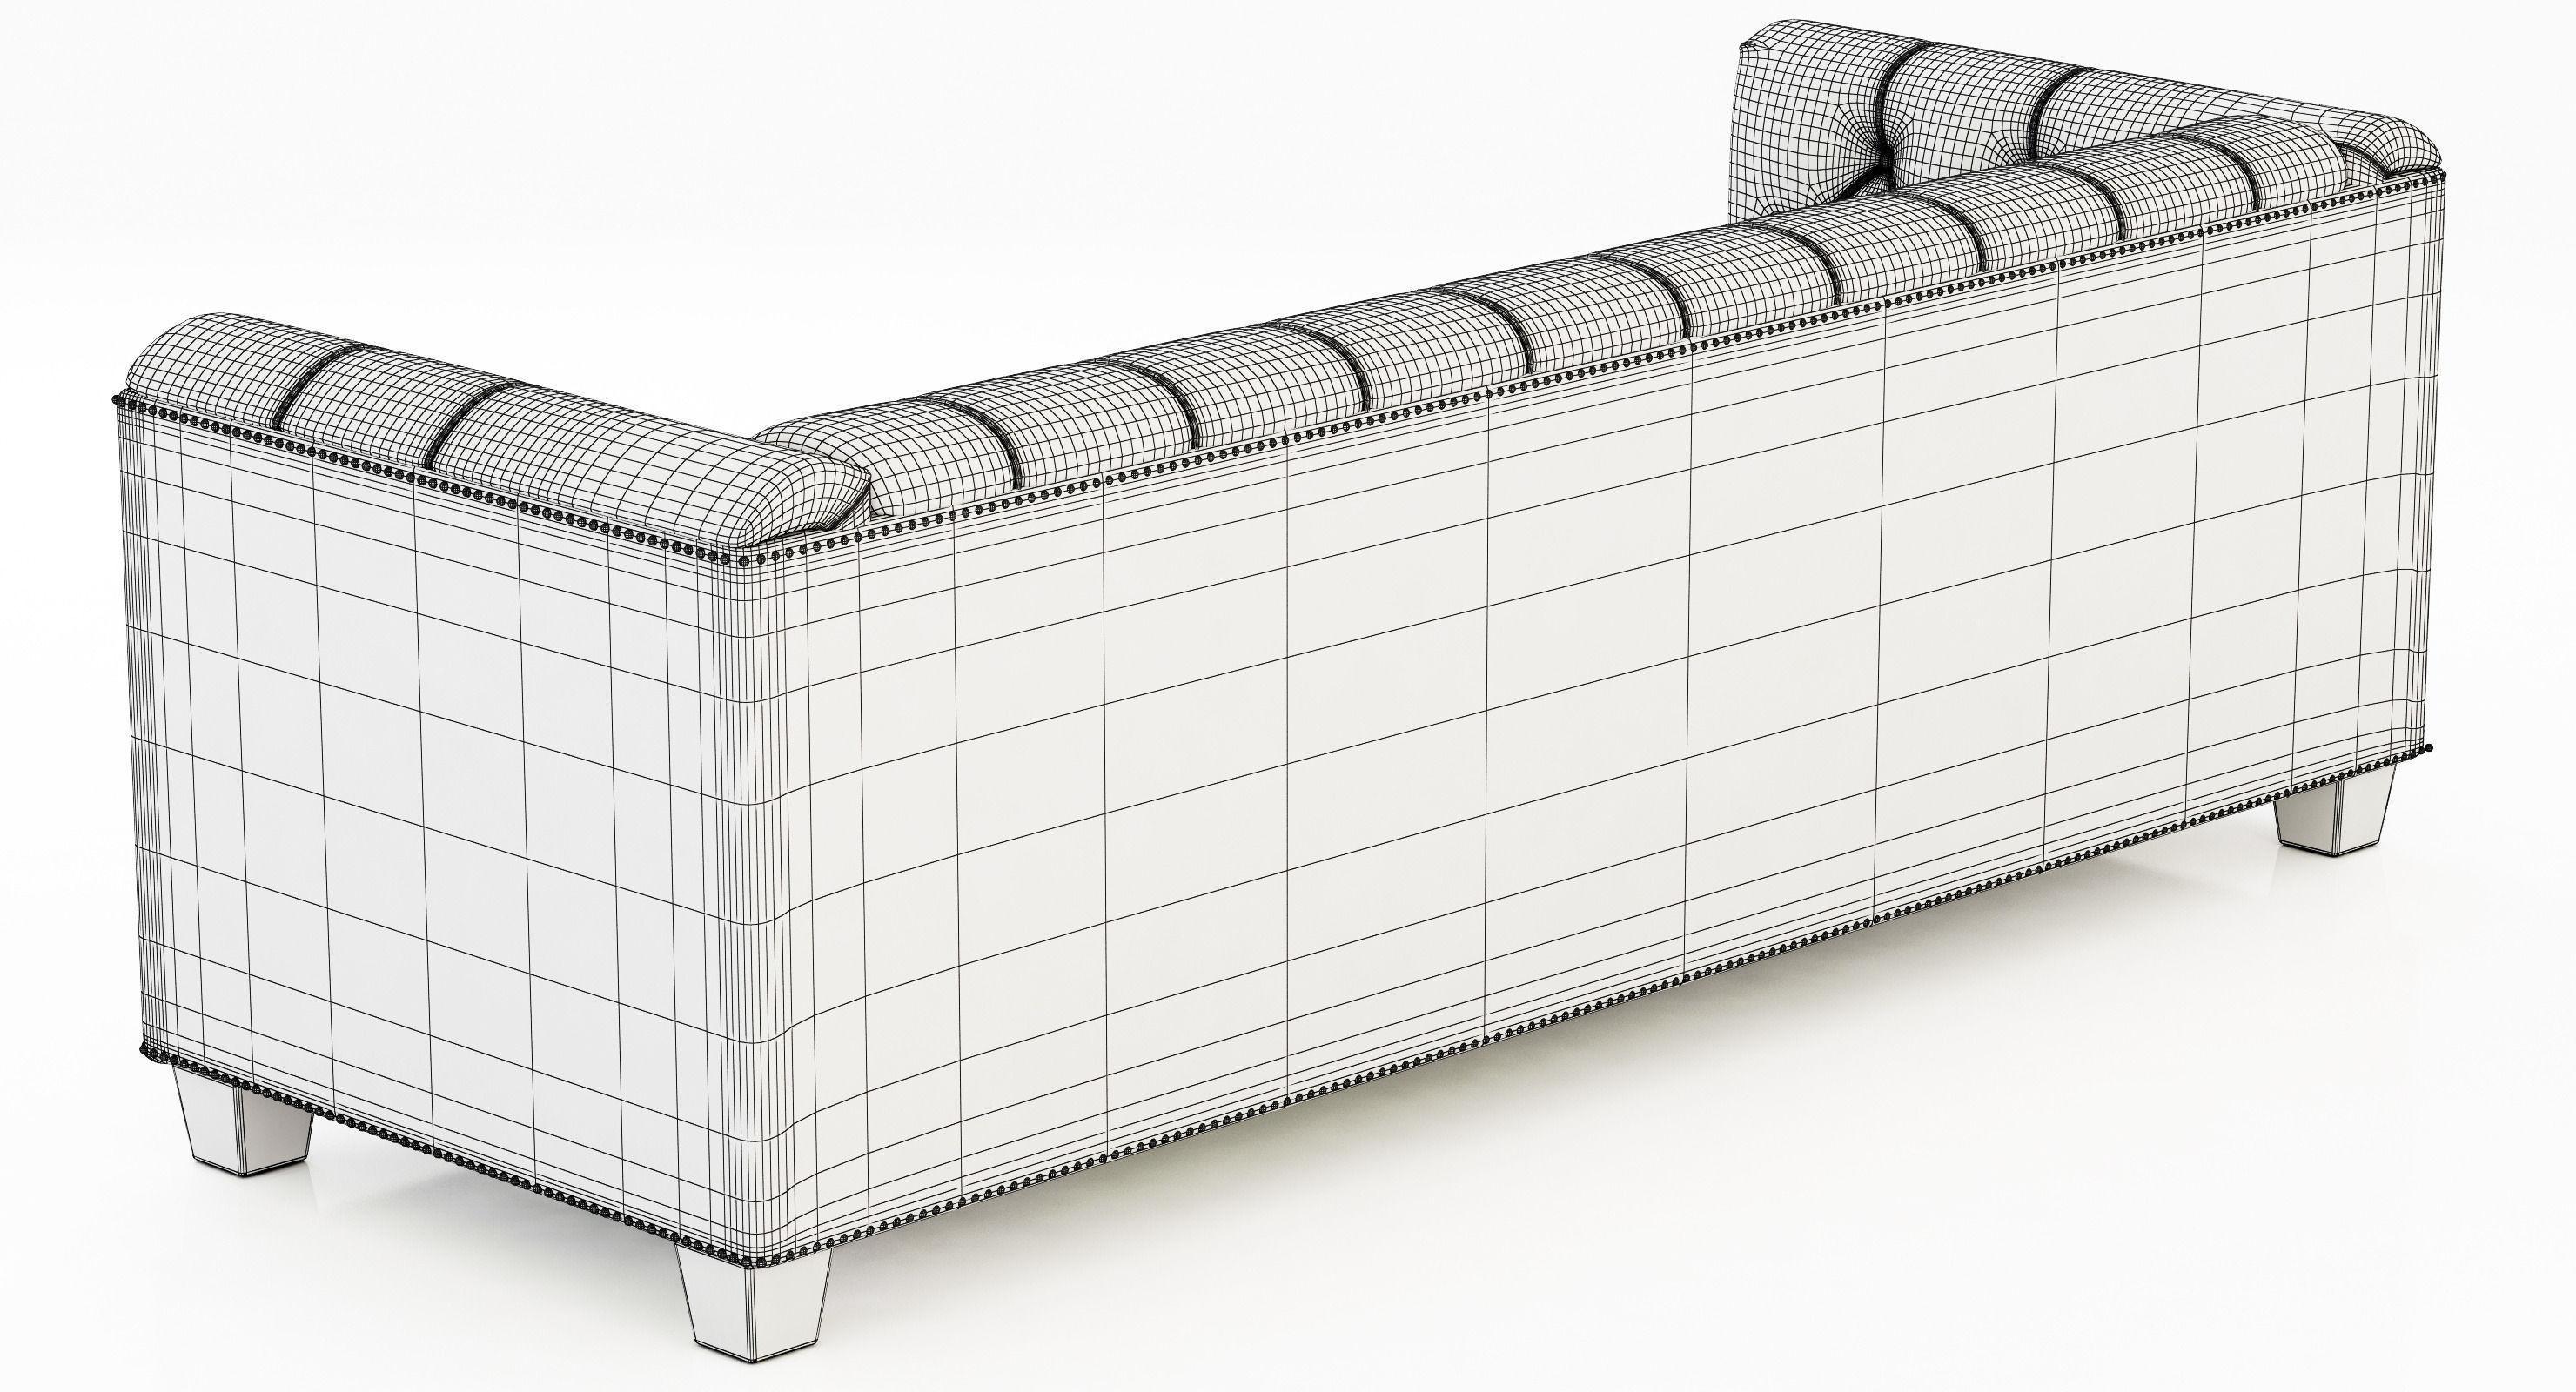 Restoration Hardware Savoy Leather Sofa 3D Model Regarding Savoy Leather Sofas (View 13 of 20)